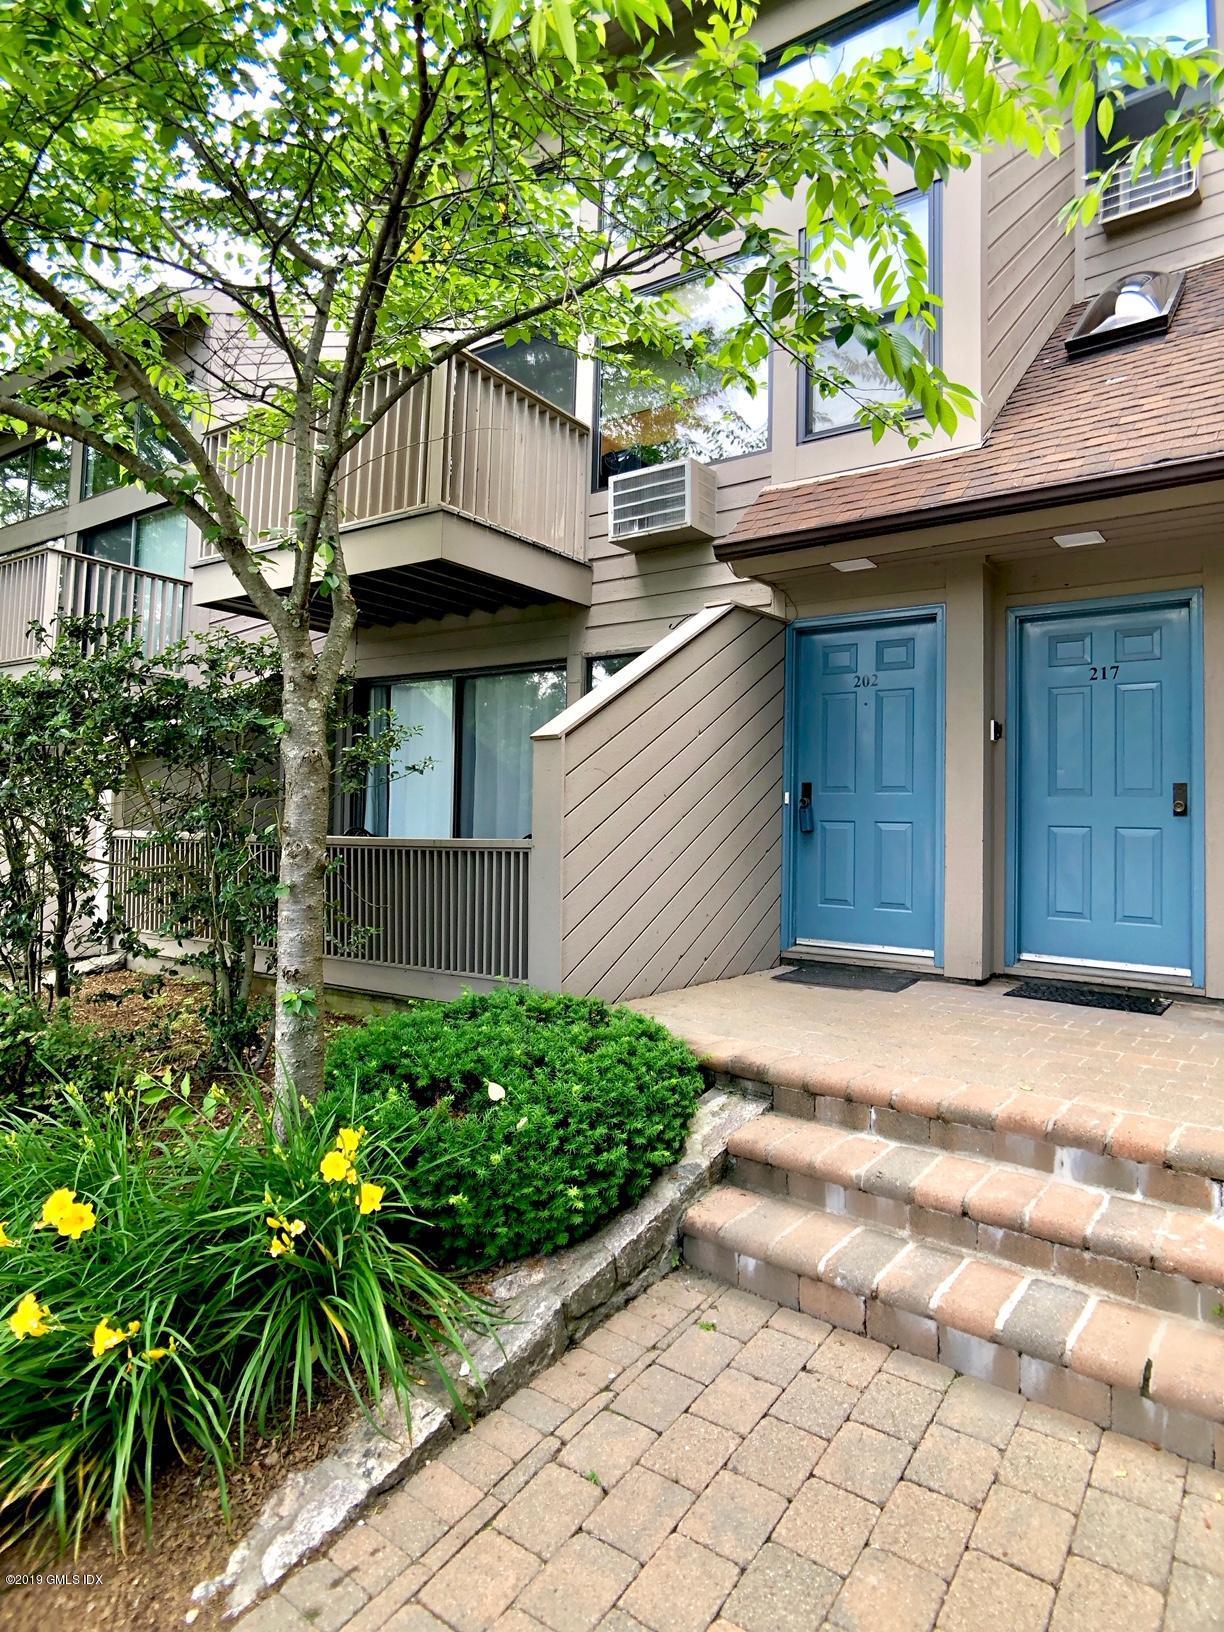 1465 Putnam Avenue,Old Greenwich,Connecticut 06870,1 Bedroom Bedrooms,1 BathroomBathrooms,Condominium,Putnam,107136